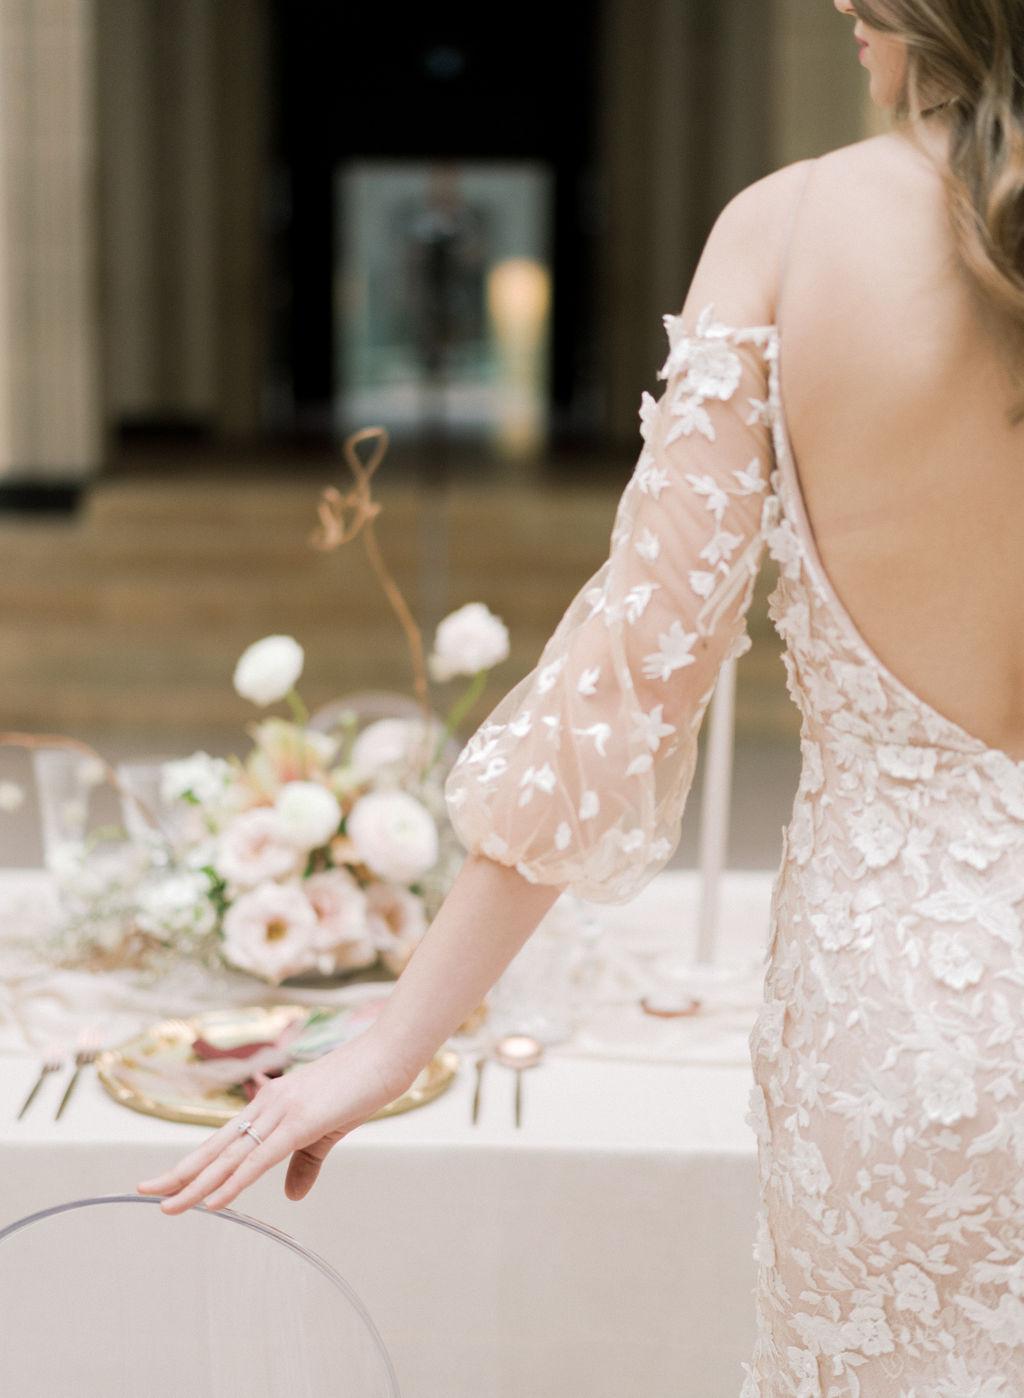 artiese-ago-wedding-editorial-06648.jpg